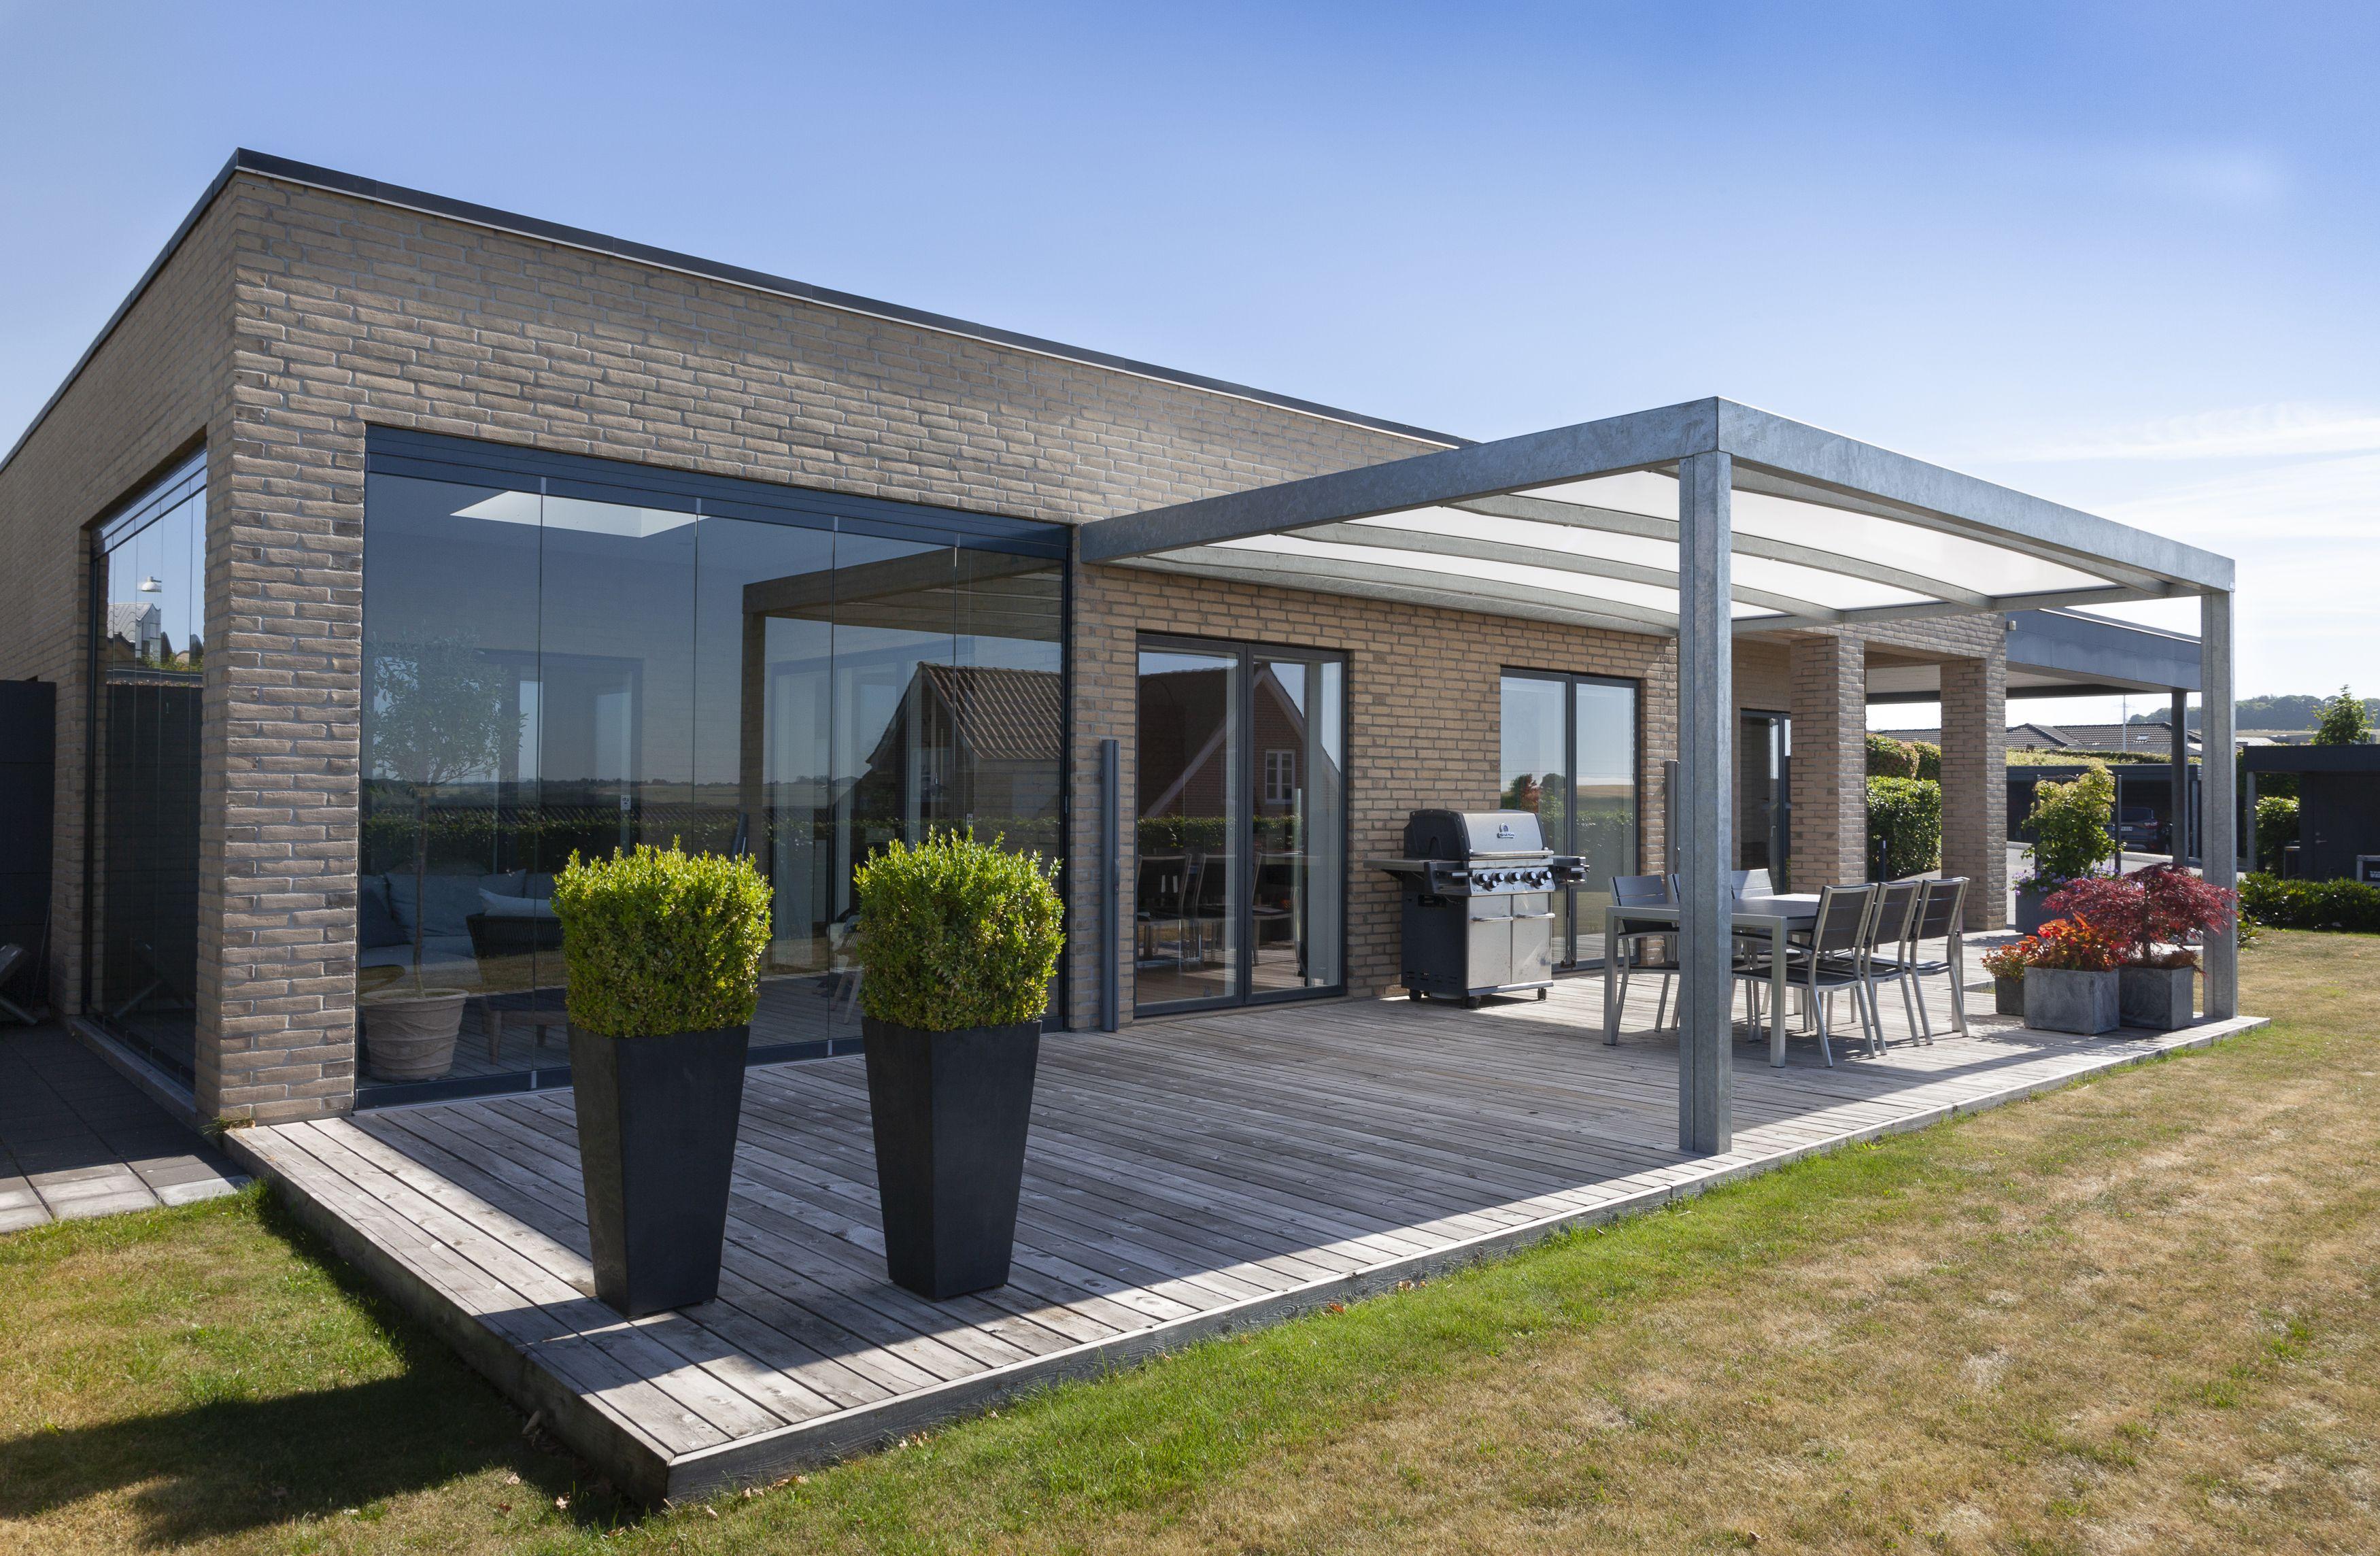 Vellidte Lyngsøe overdækket terrasse er en flot og elegant HG-31